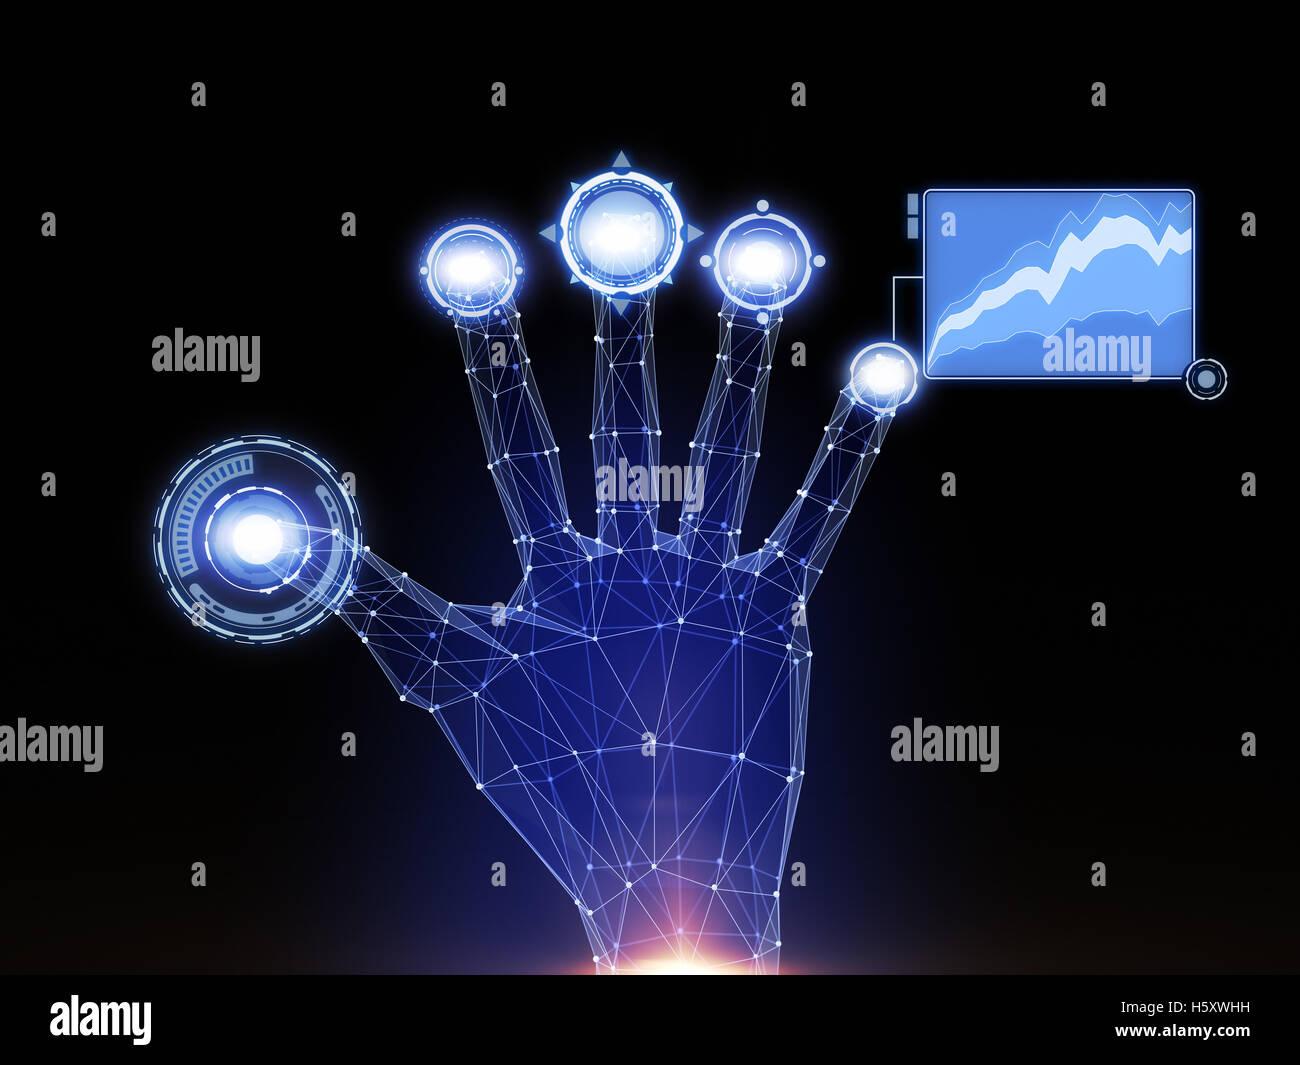 Digital mano tocca Sci-Fi interface Immagini Stock